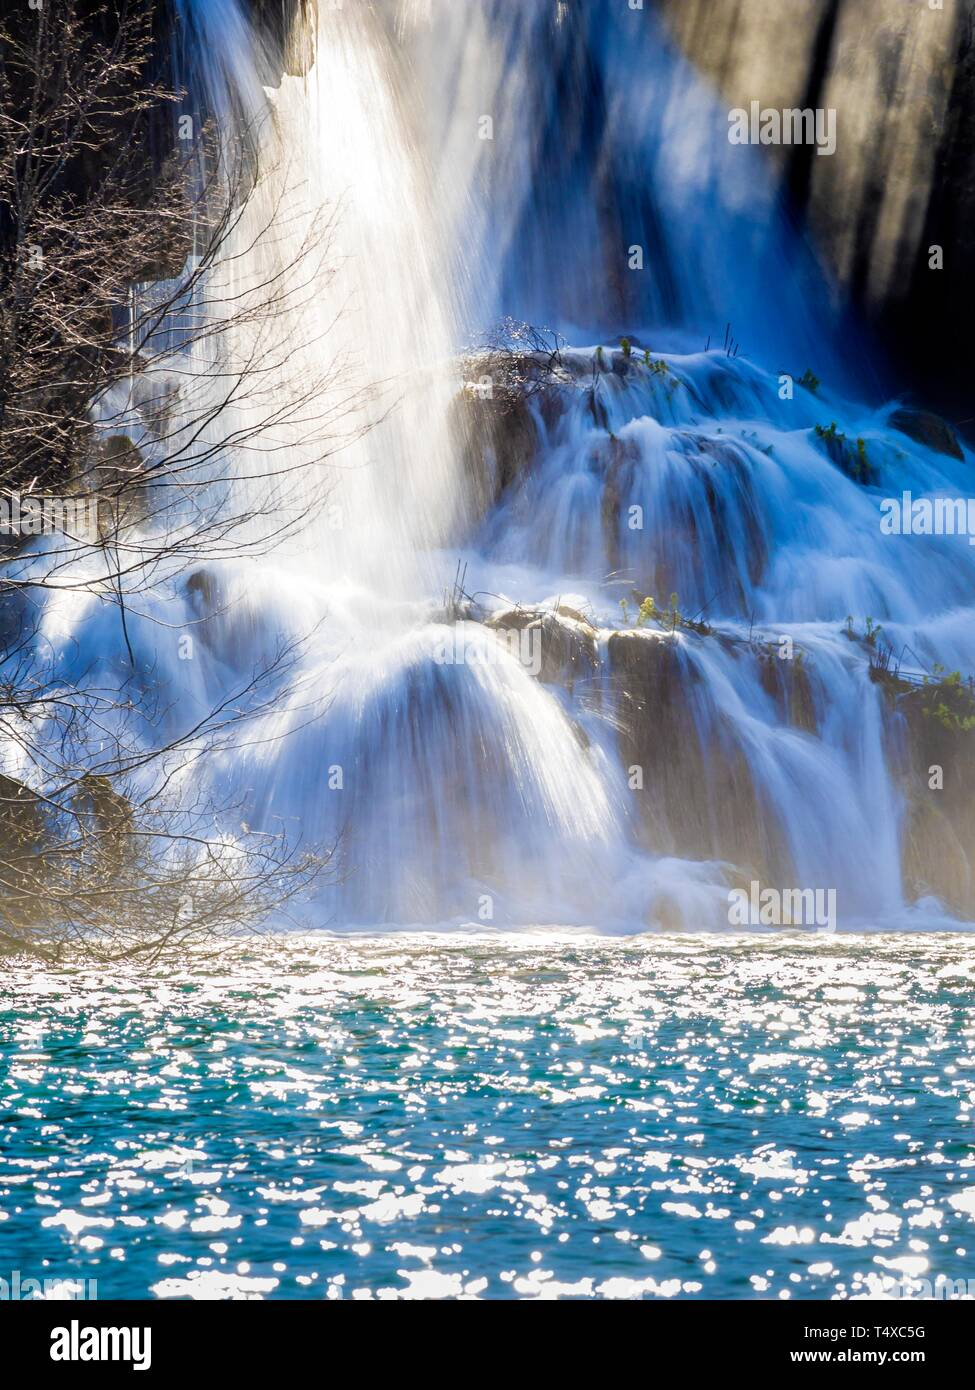 Plitvice lakes in Croatia Plitvicka jezera - Stock Image